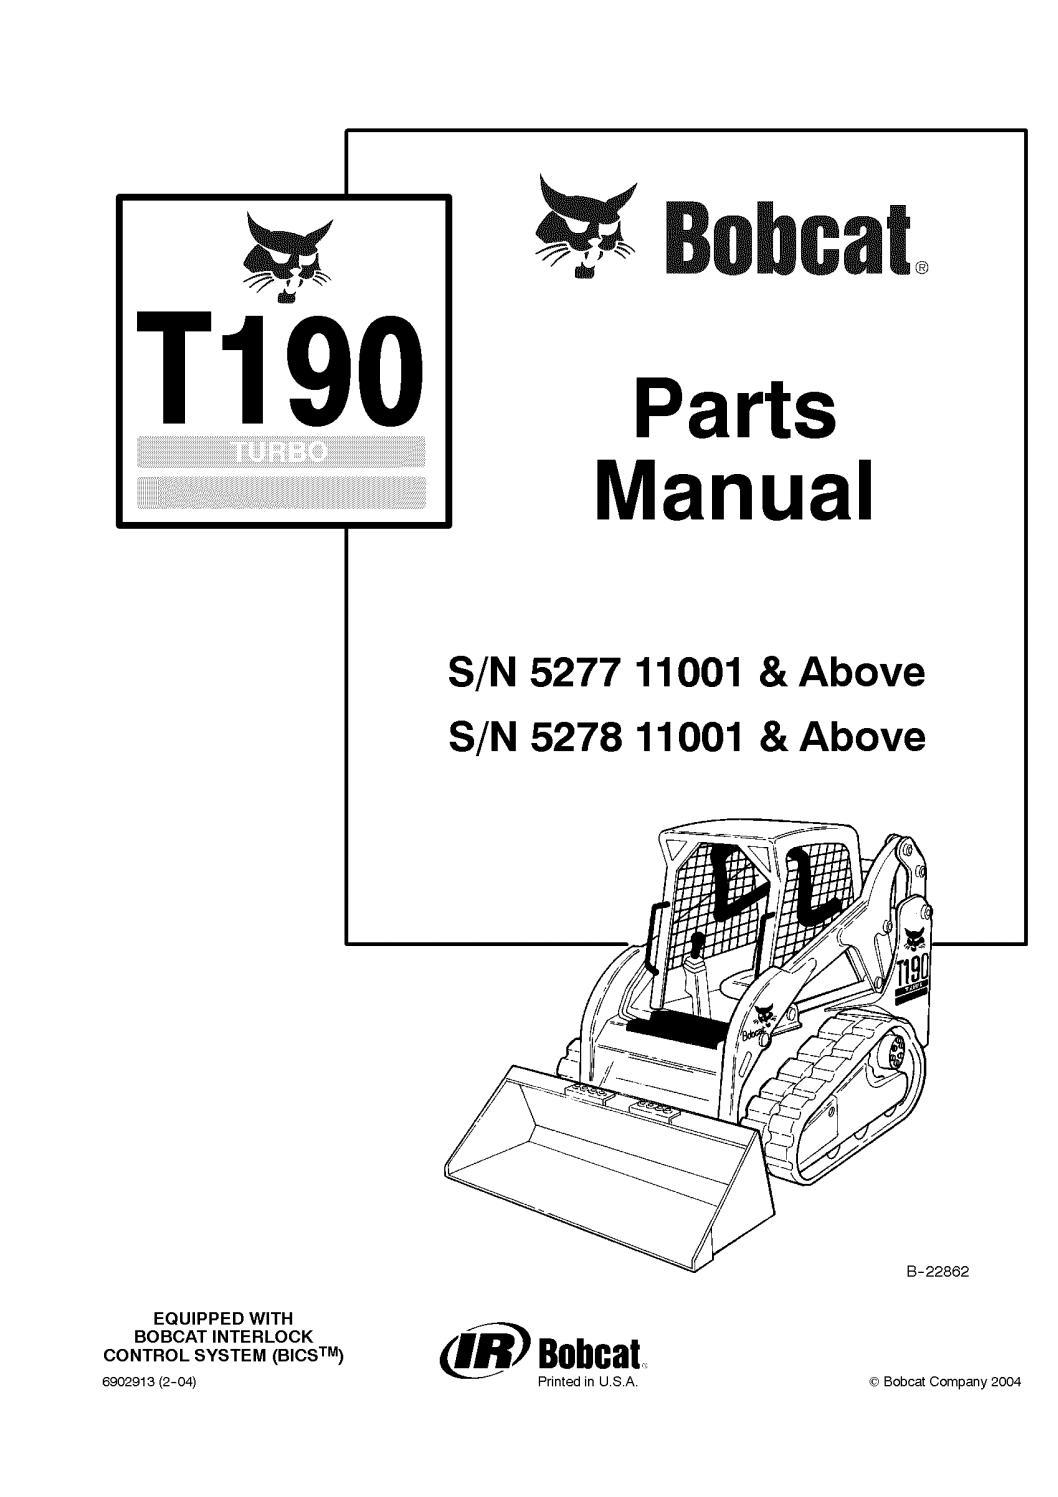 hight resolution of bobcat t190 schematic wiring diagram autovehiclebobcat t190 schematic wiring diagram mega2013 bobcat t190 wiring diagram wiring